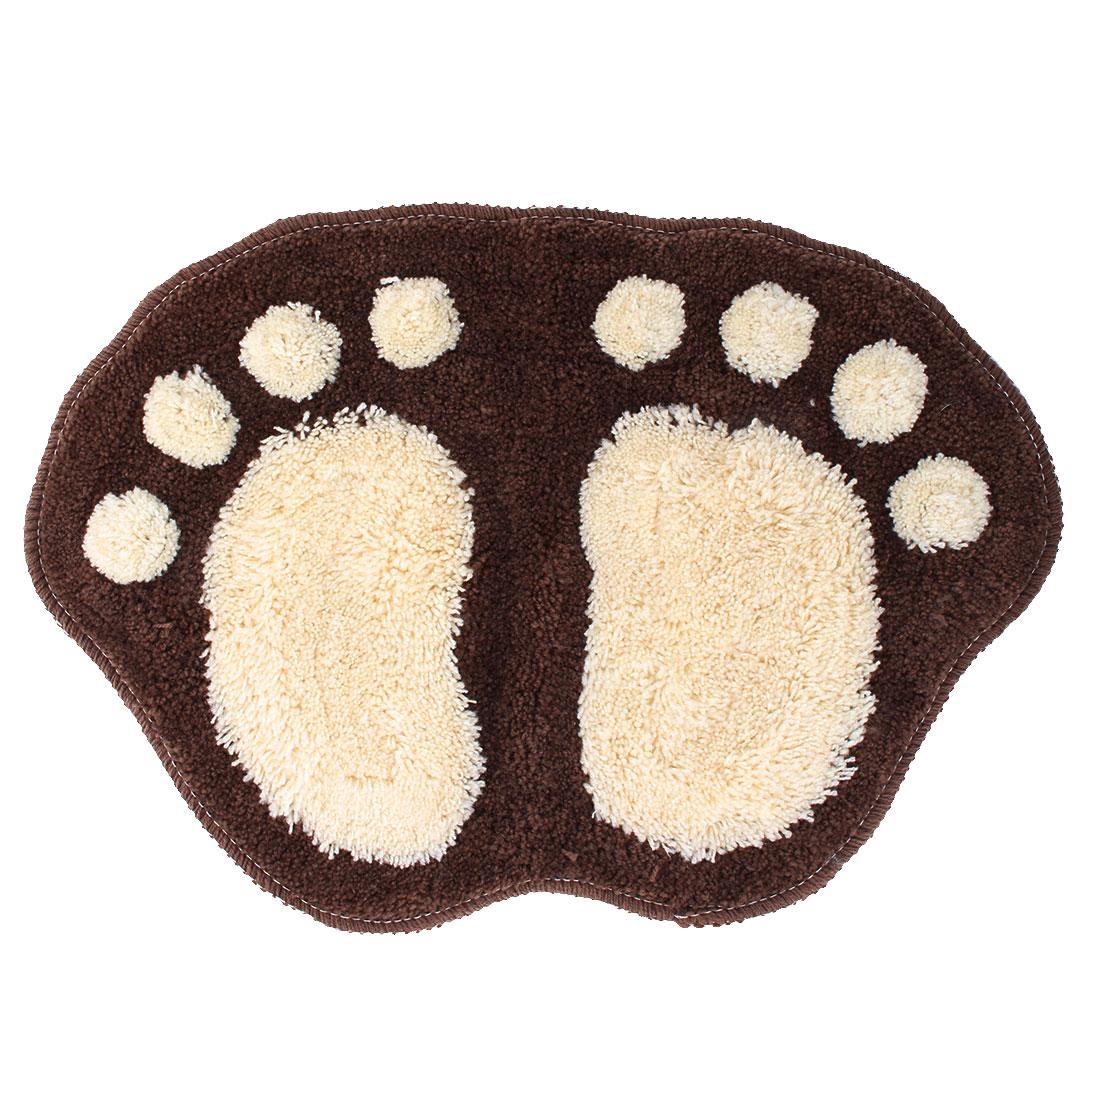 Bathroom Washroom Footprint Pattern Water Absorb Non-slip Floor Mat Cushion Rug Coffee Color